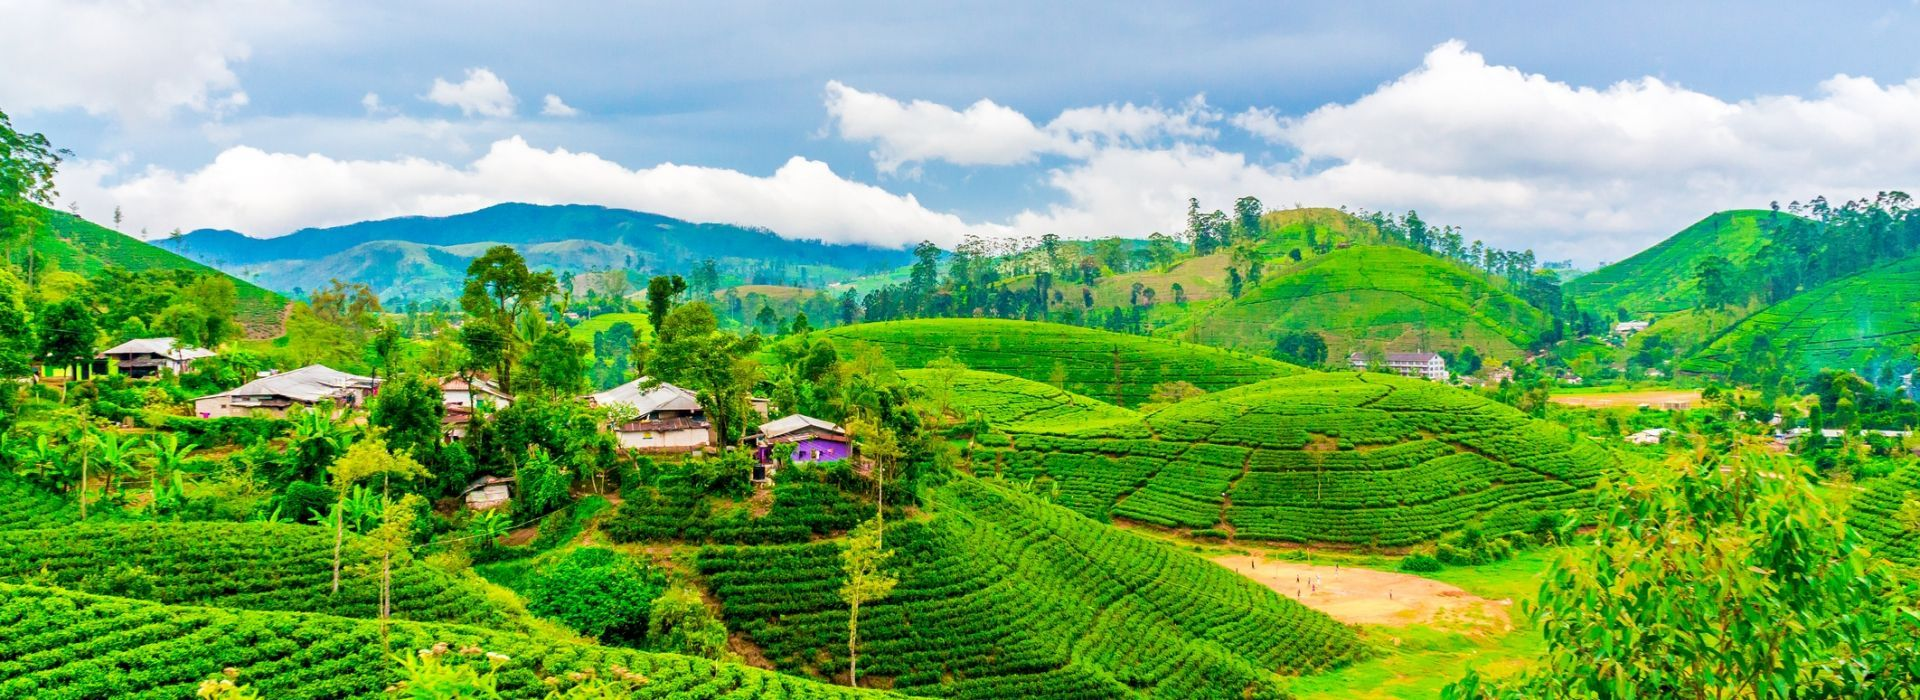 City sightseeing Tours in Sri Lanka